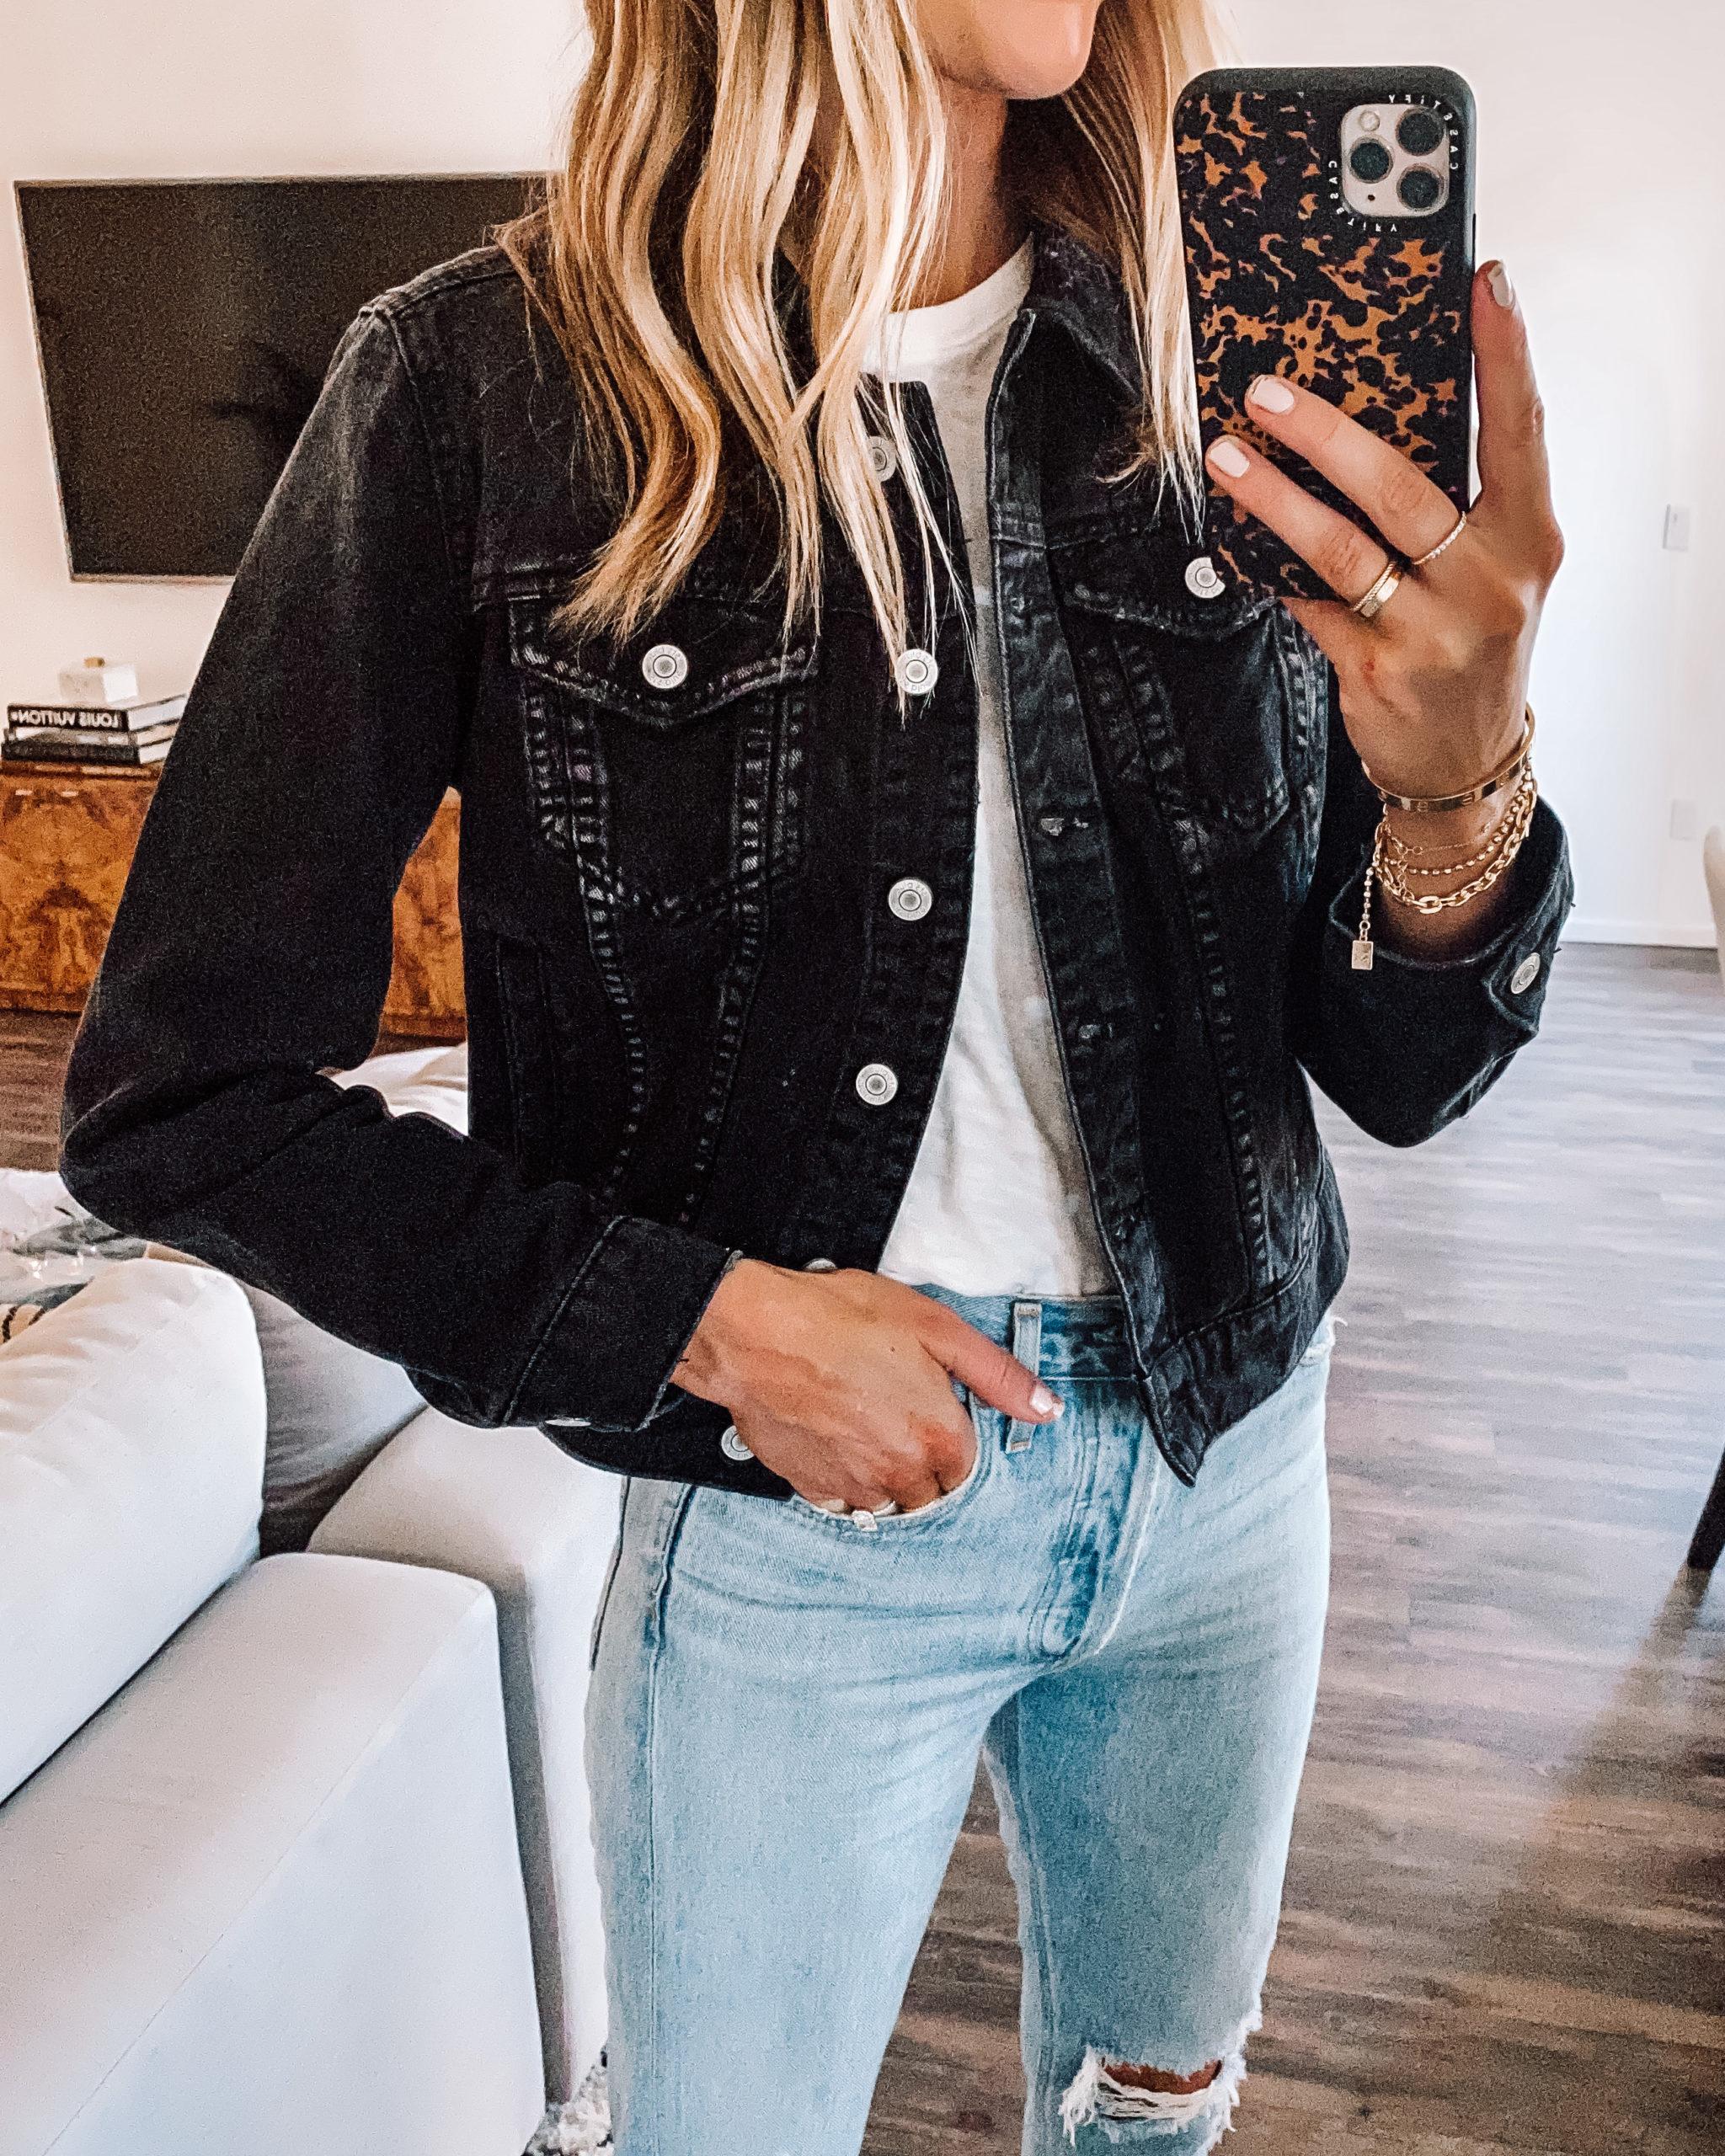 Fashion Jackson Wearing Black Denim Jacket White Tshirt Ripped Denim Jeans